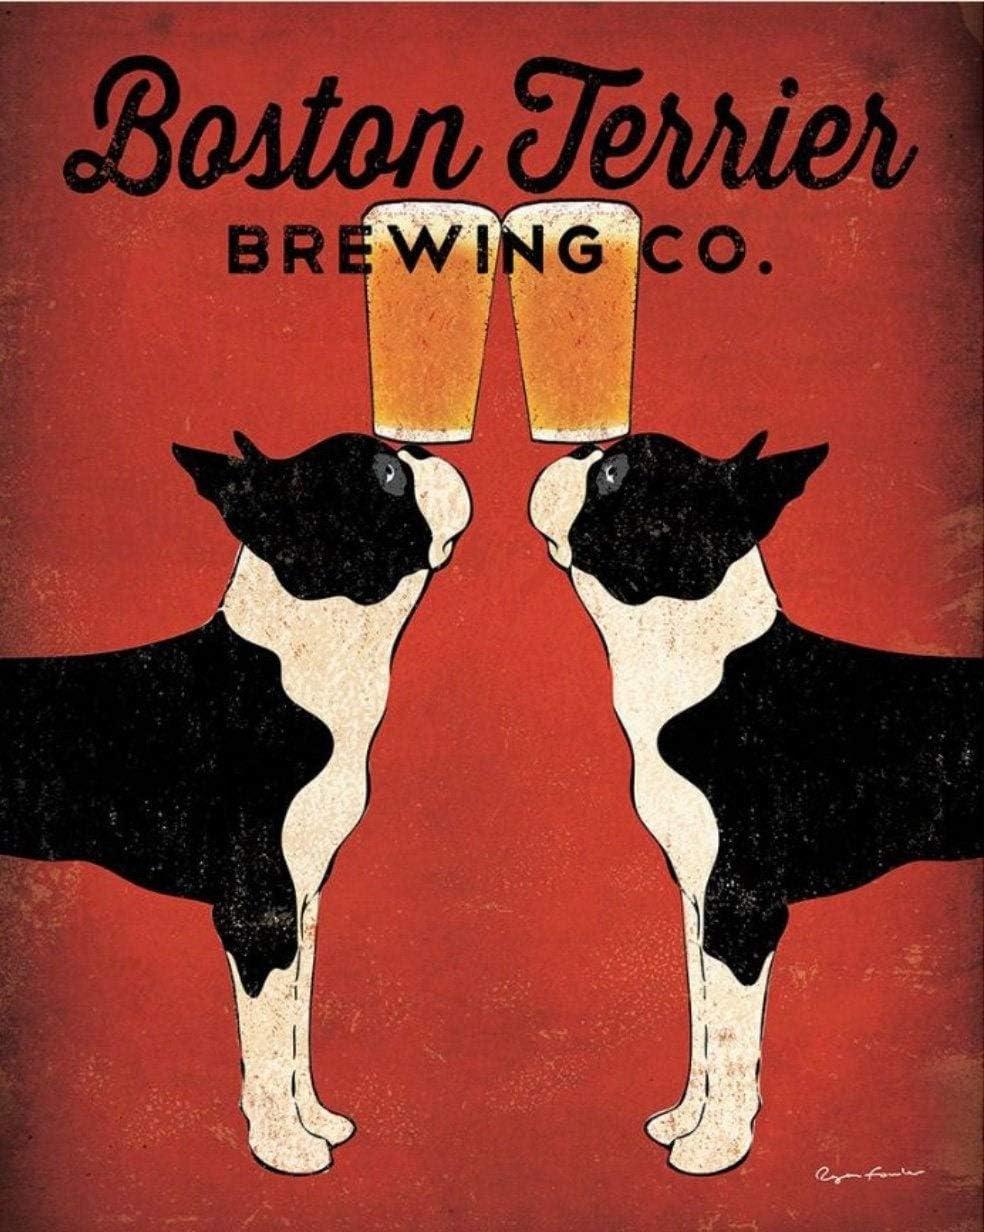 Metal SignAluminum Sign Vintage Boston Brewing Company Ad Print, Boston Terrier Print, Dog Print, Iron Painting Yard Sign 8x12 Inches